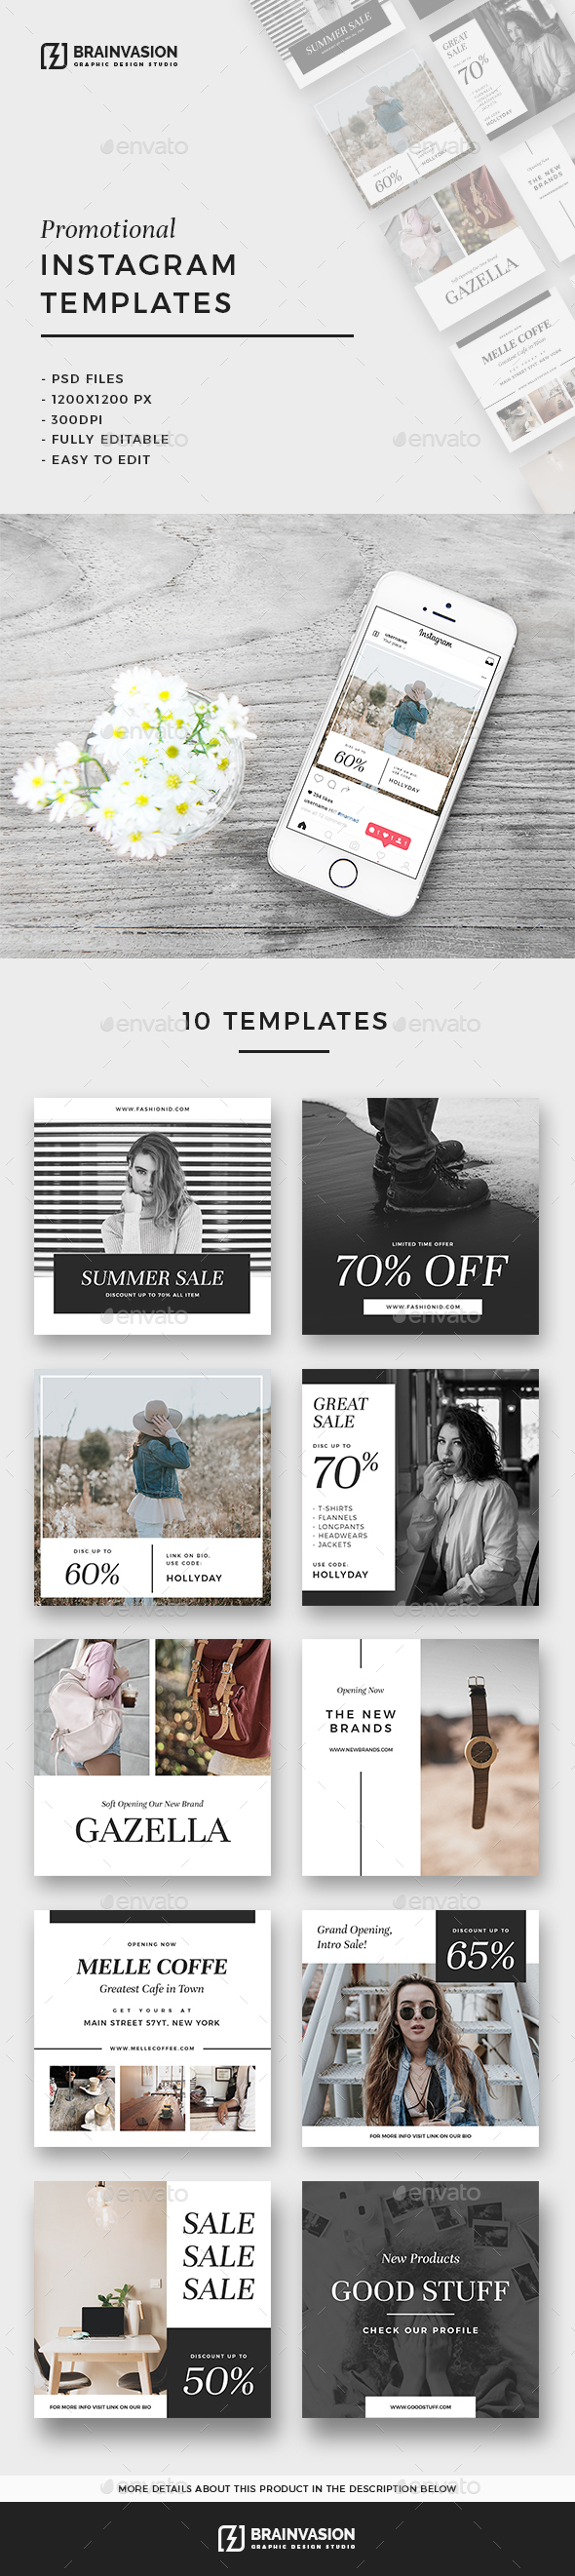 10 Promotional Instagram Templates - Miscellaneous Social Media